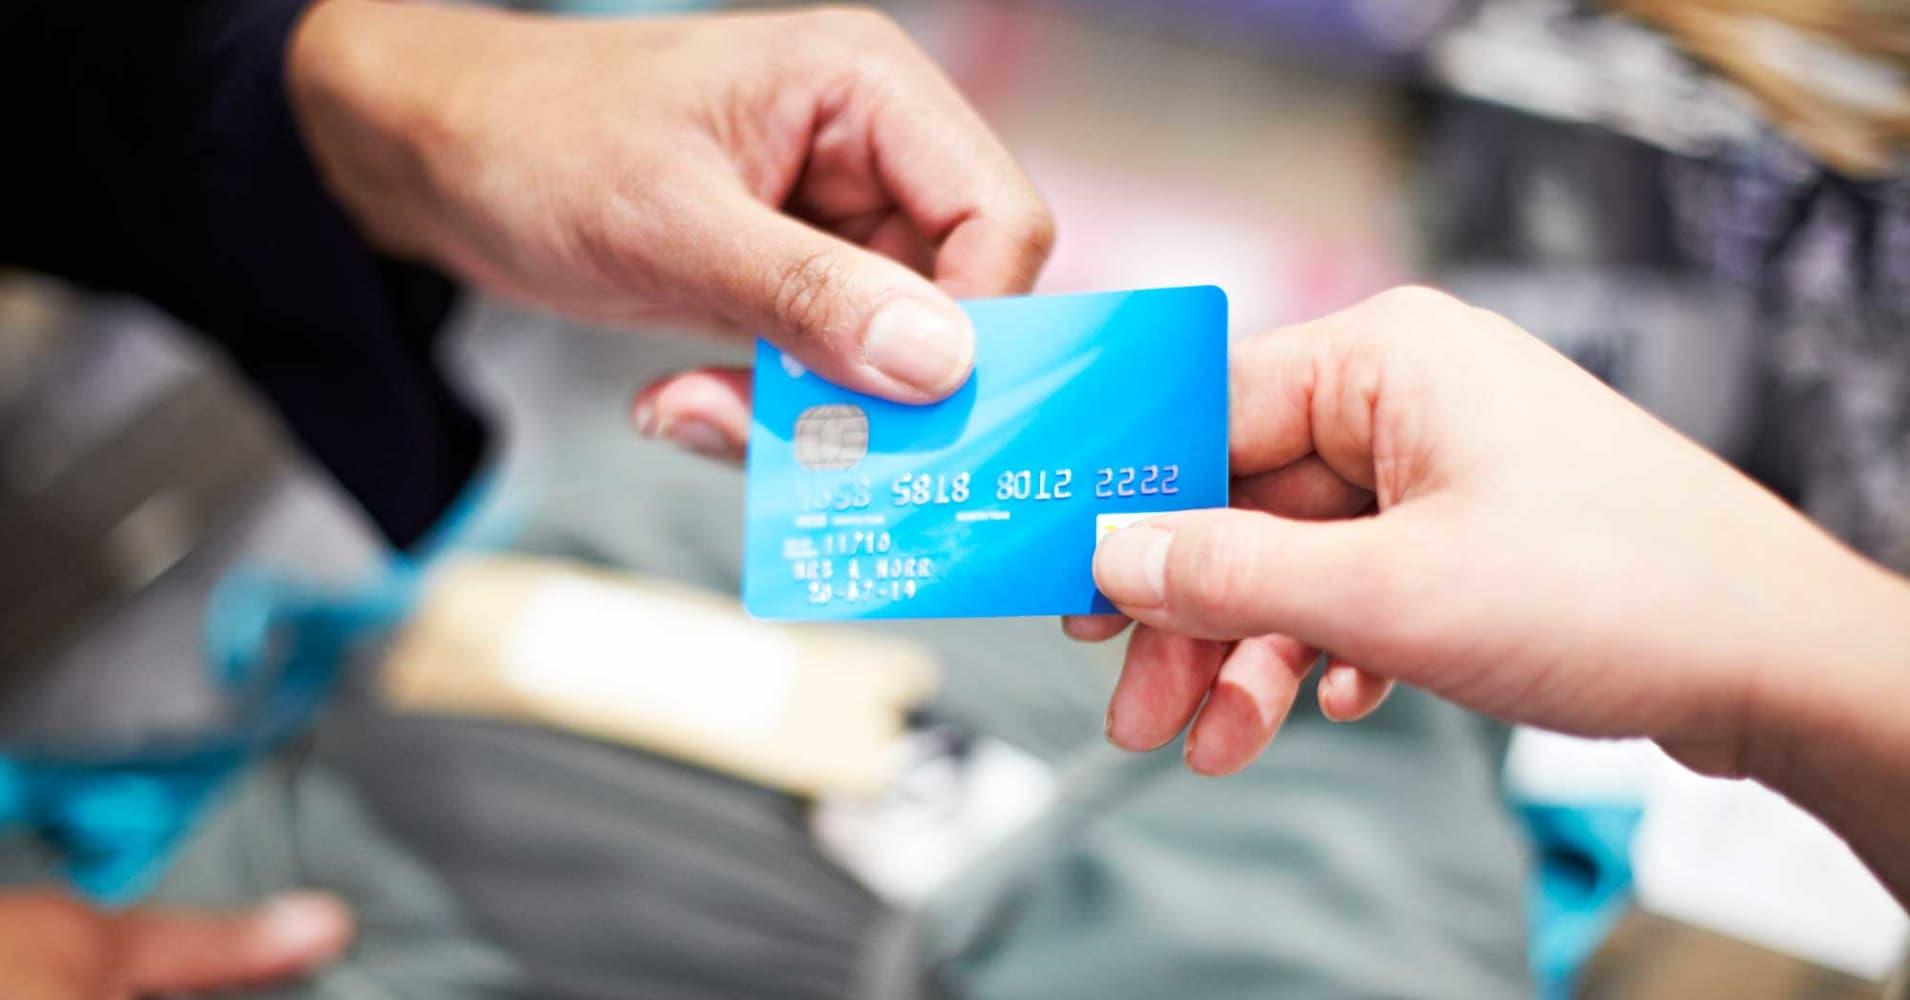 Best Rewards Card For Business Travelers